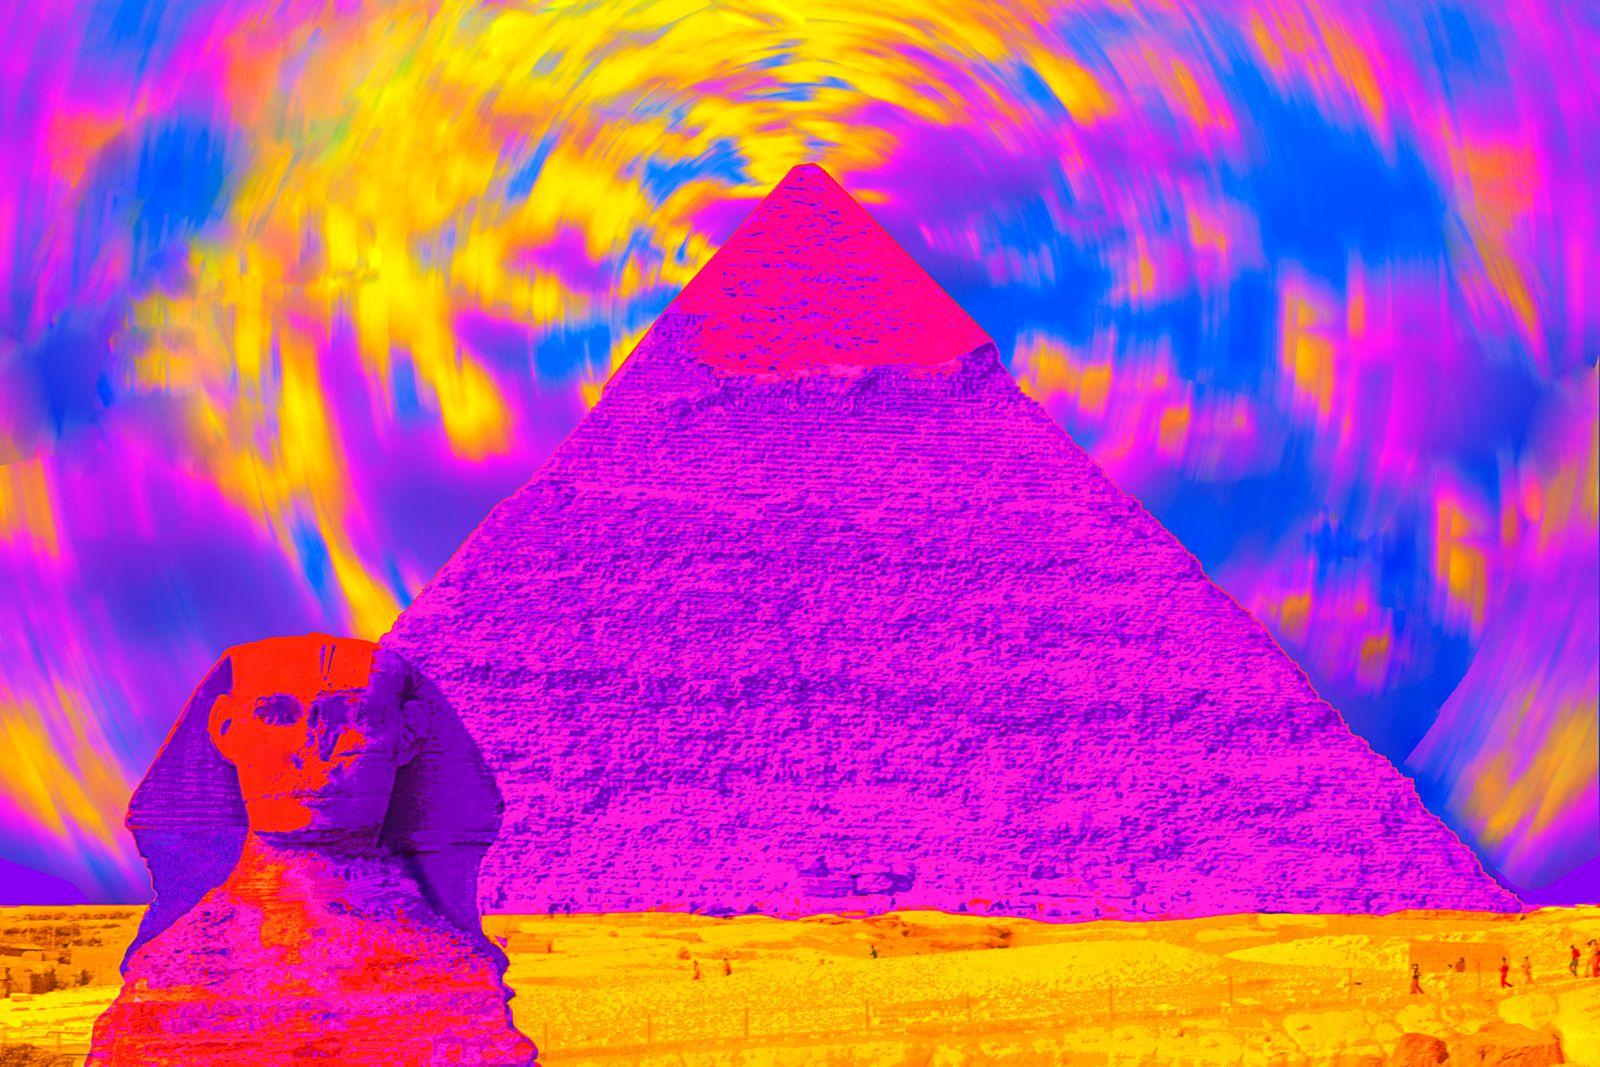 Gottlieb-Egypt Pyramid & Sphnix